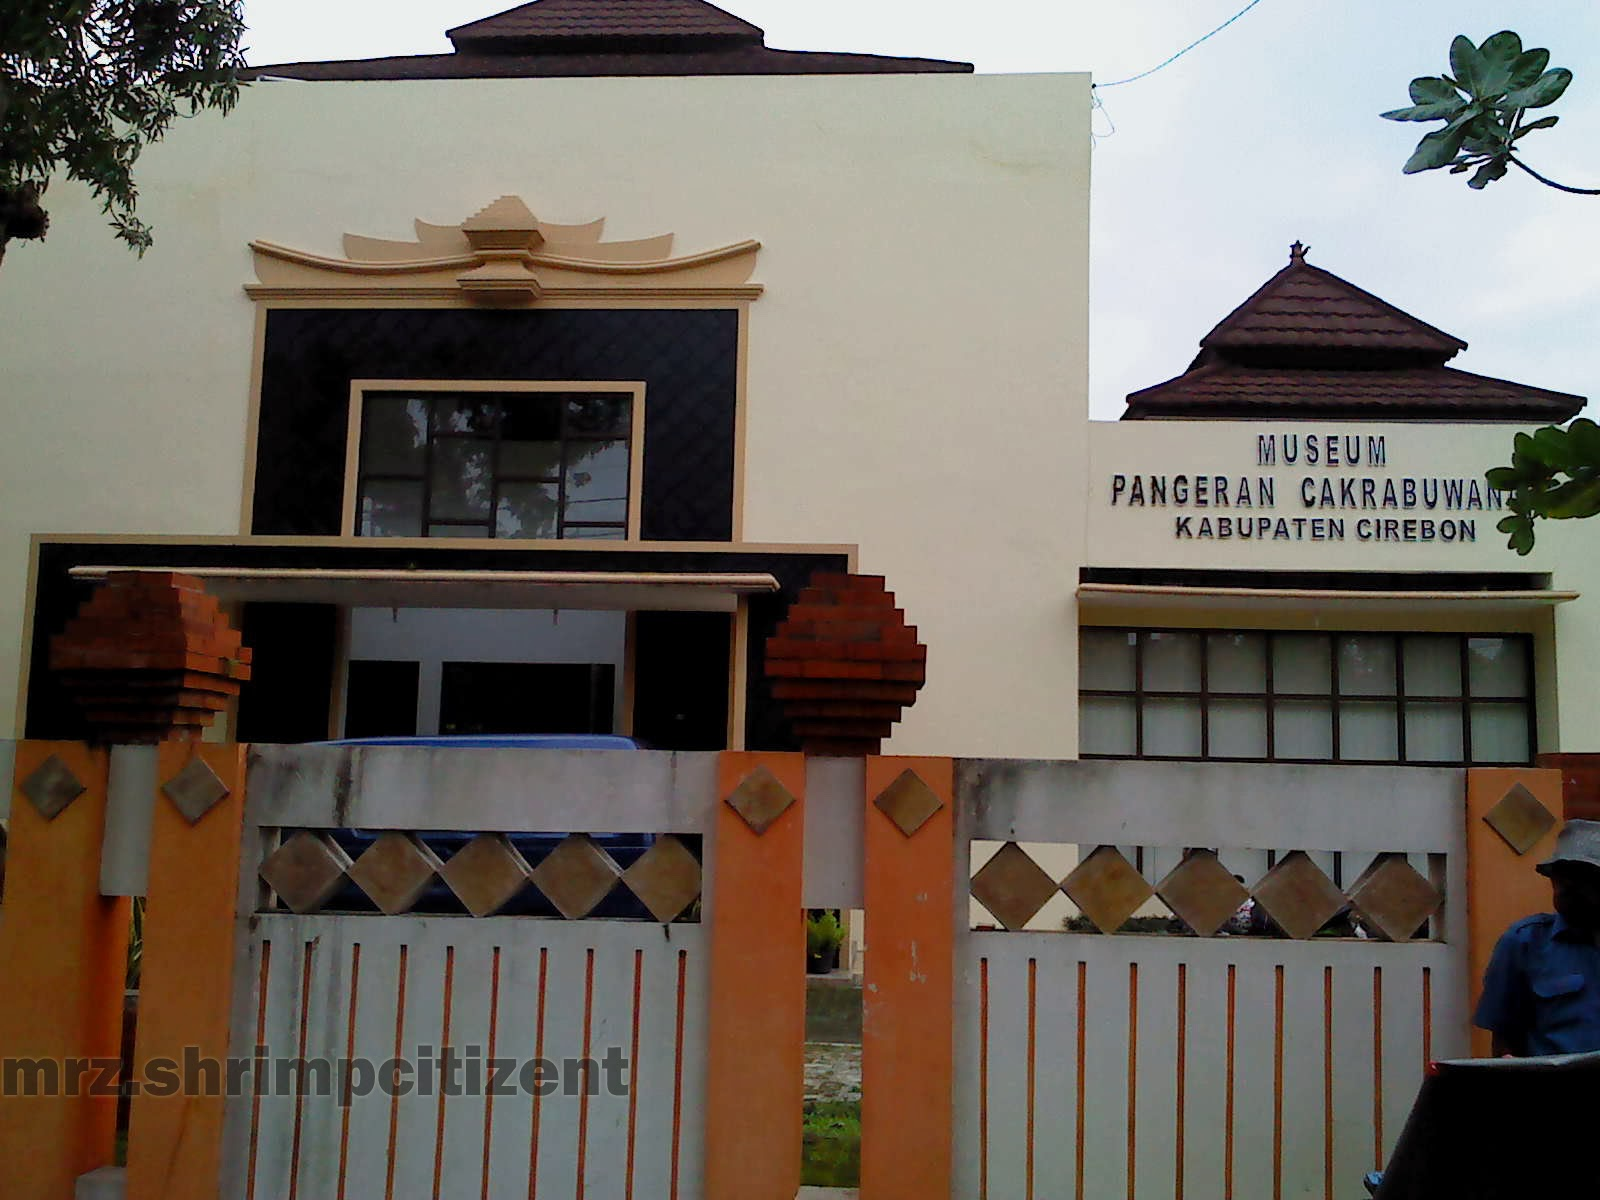 Musem Pangeran Cakrabuana Kabupaten Cirebon 3